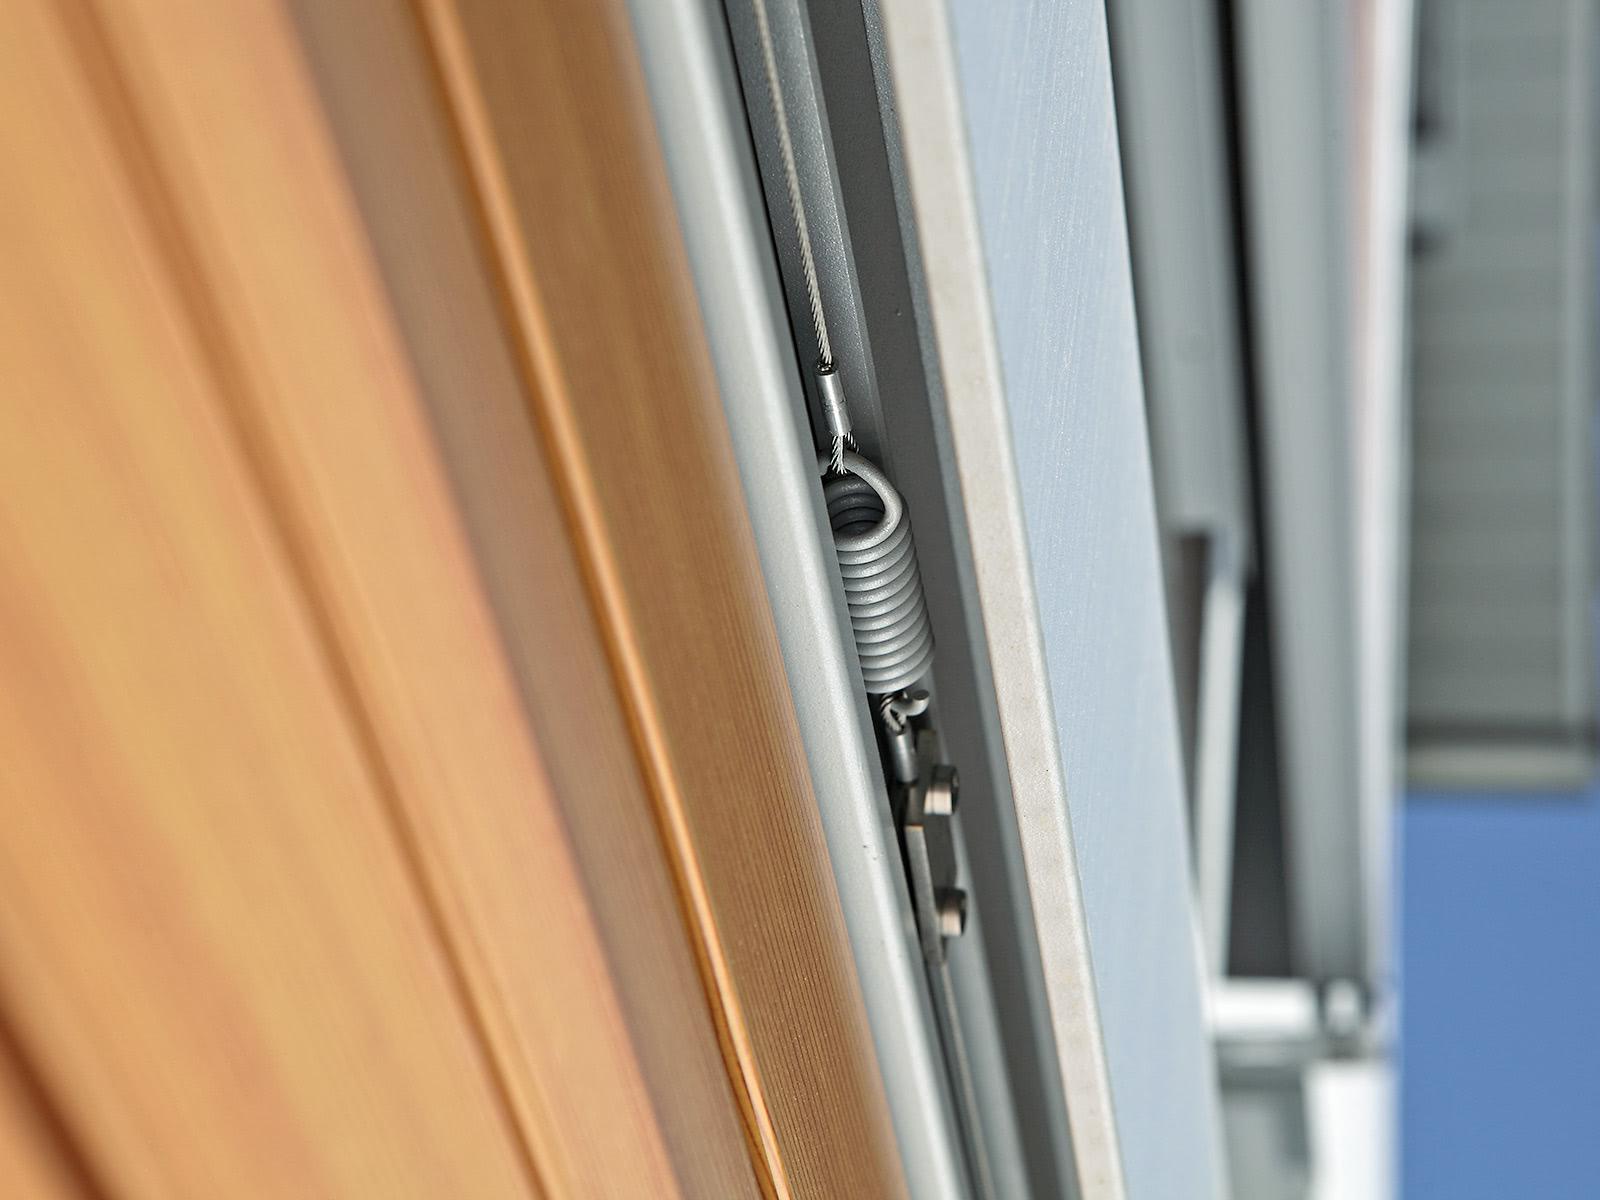 Sliding shutters - motorisation